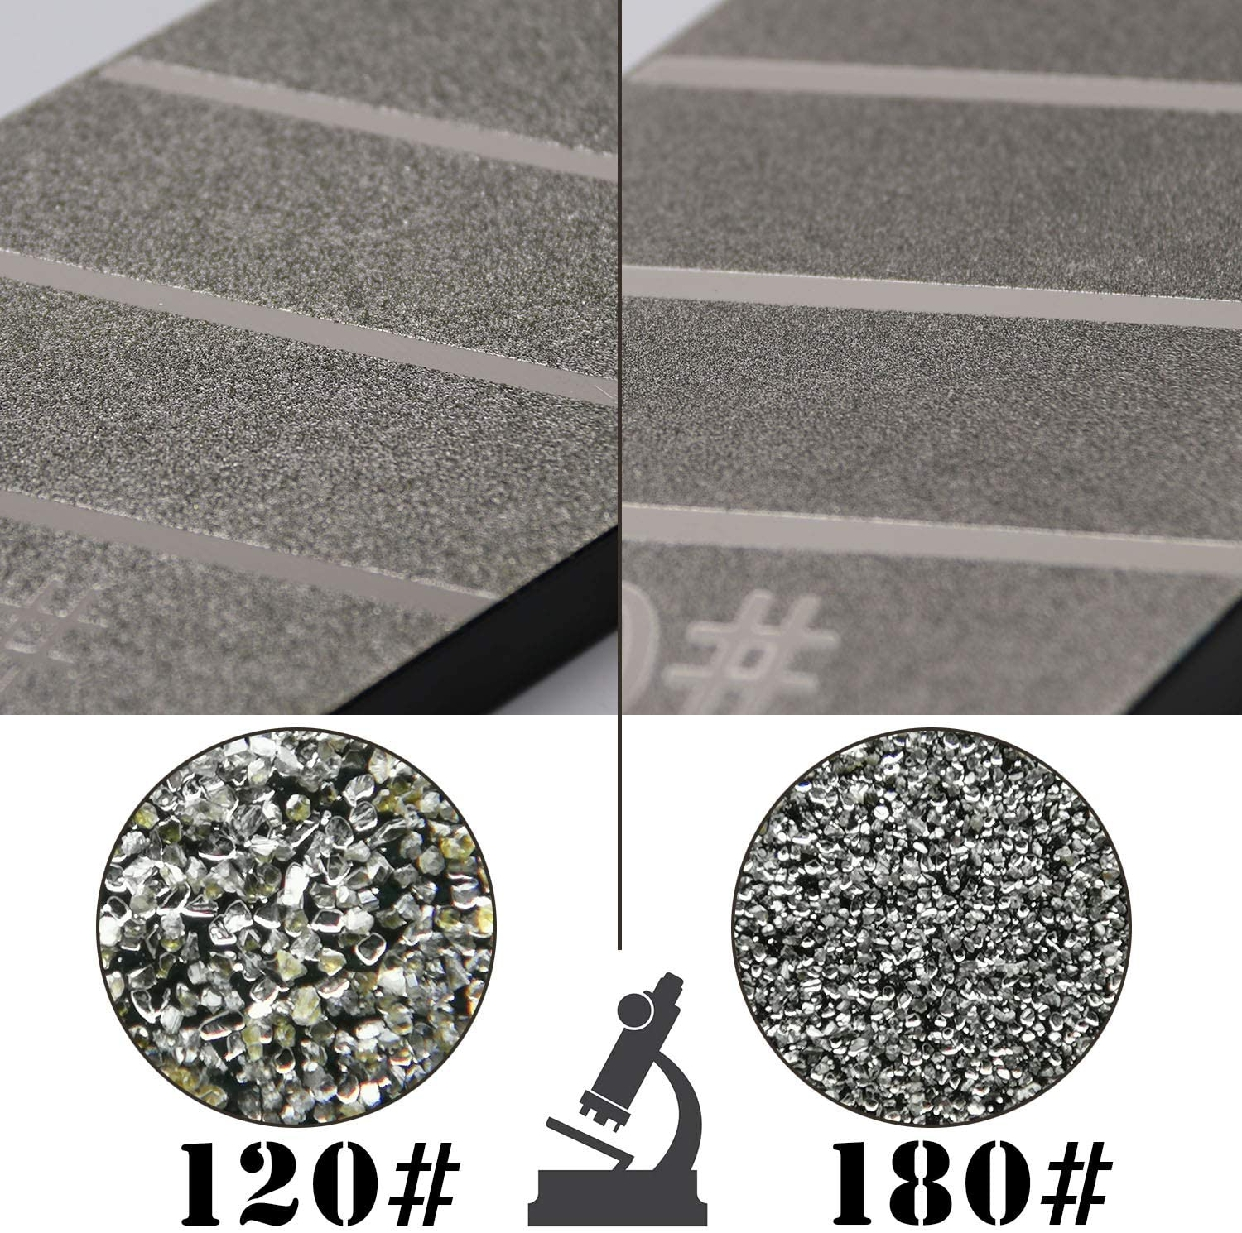 GOKEI 面直し用砥石 両面2役タイプ #180/#120 258×75×13mmの商品画像4